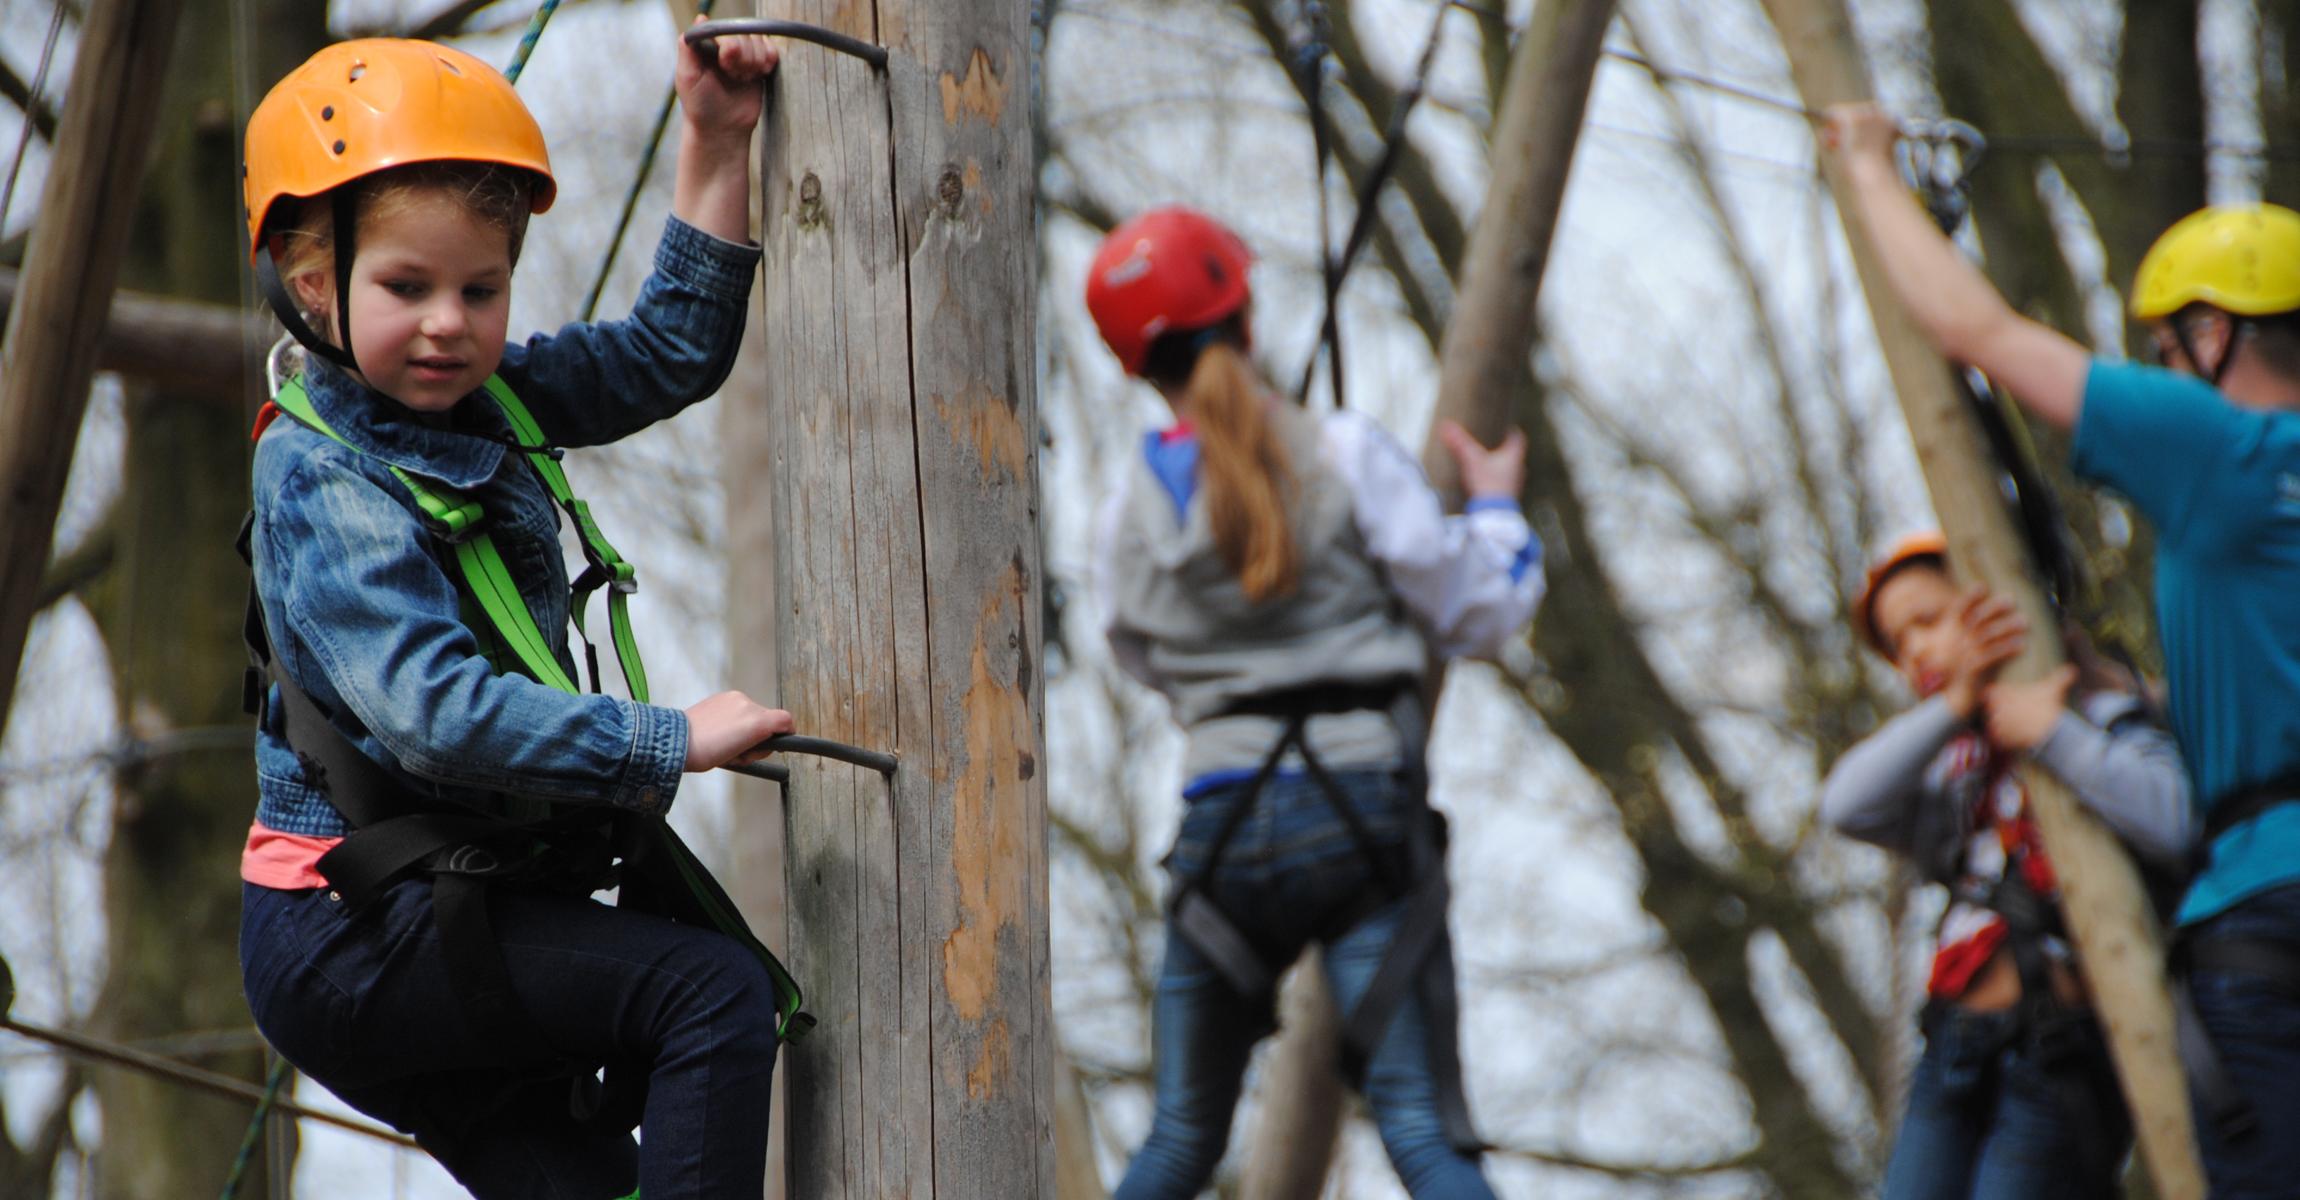 Kinderfeestje Eindhoven Op Noord klimmen